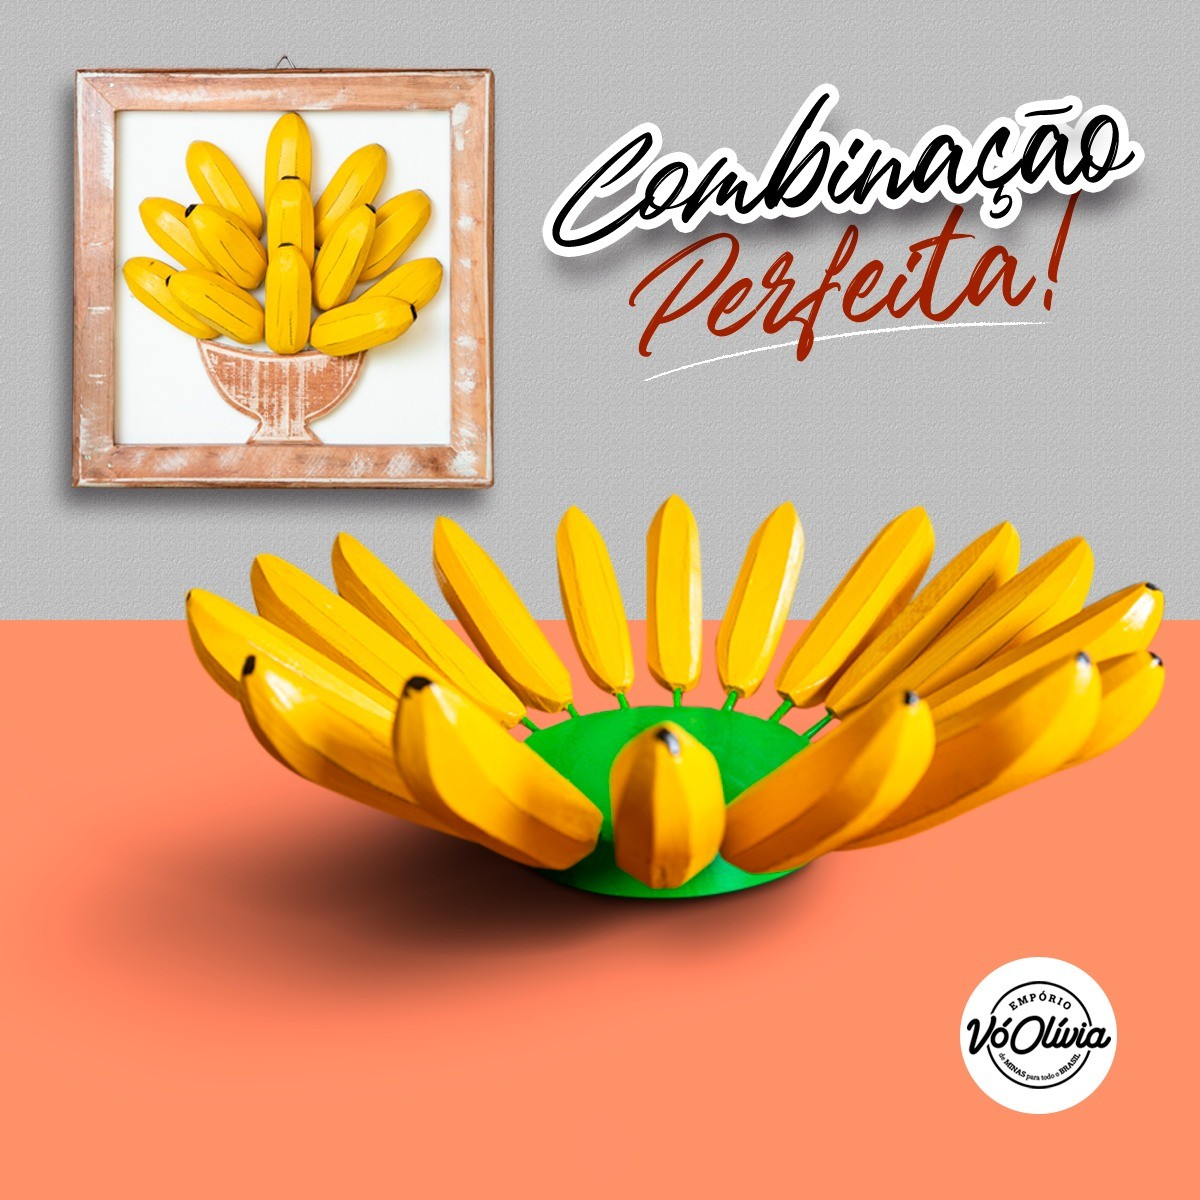 Kit Combinação Perfeita - Banana